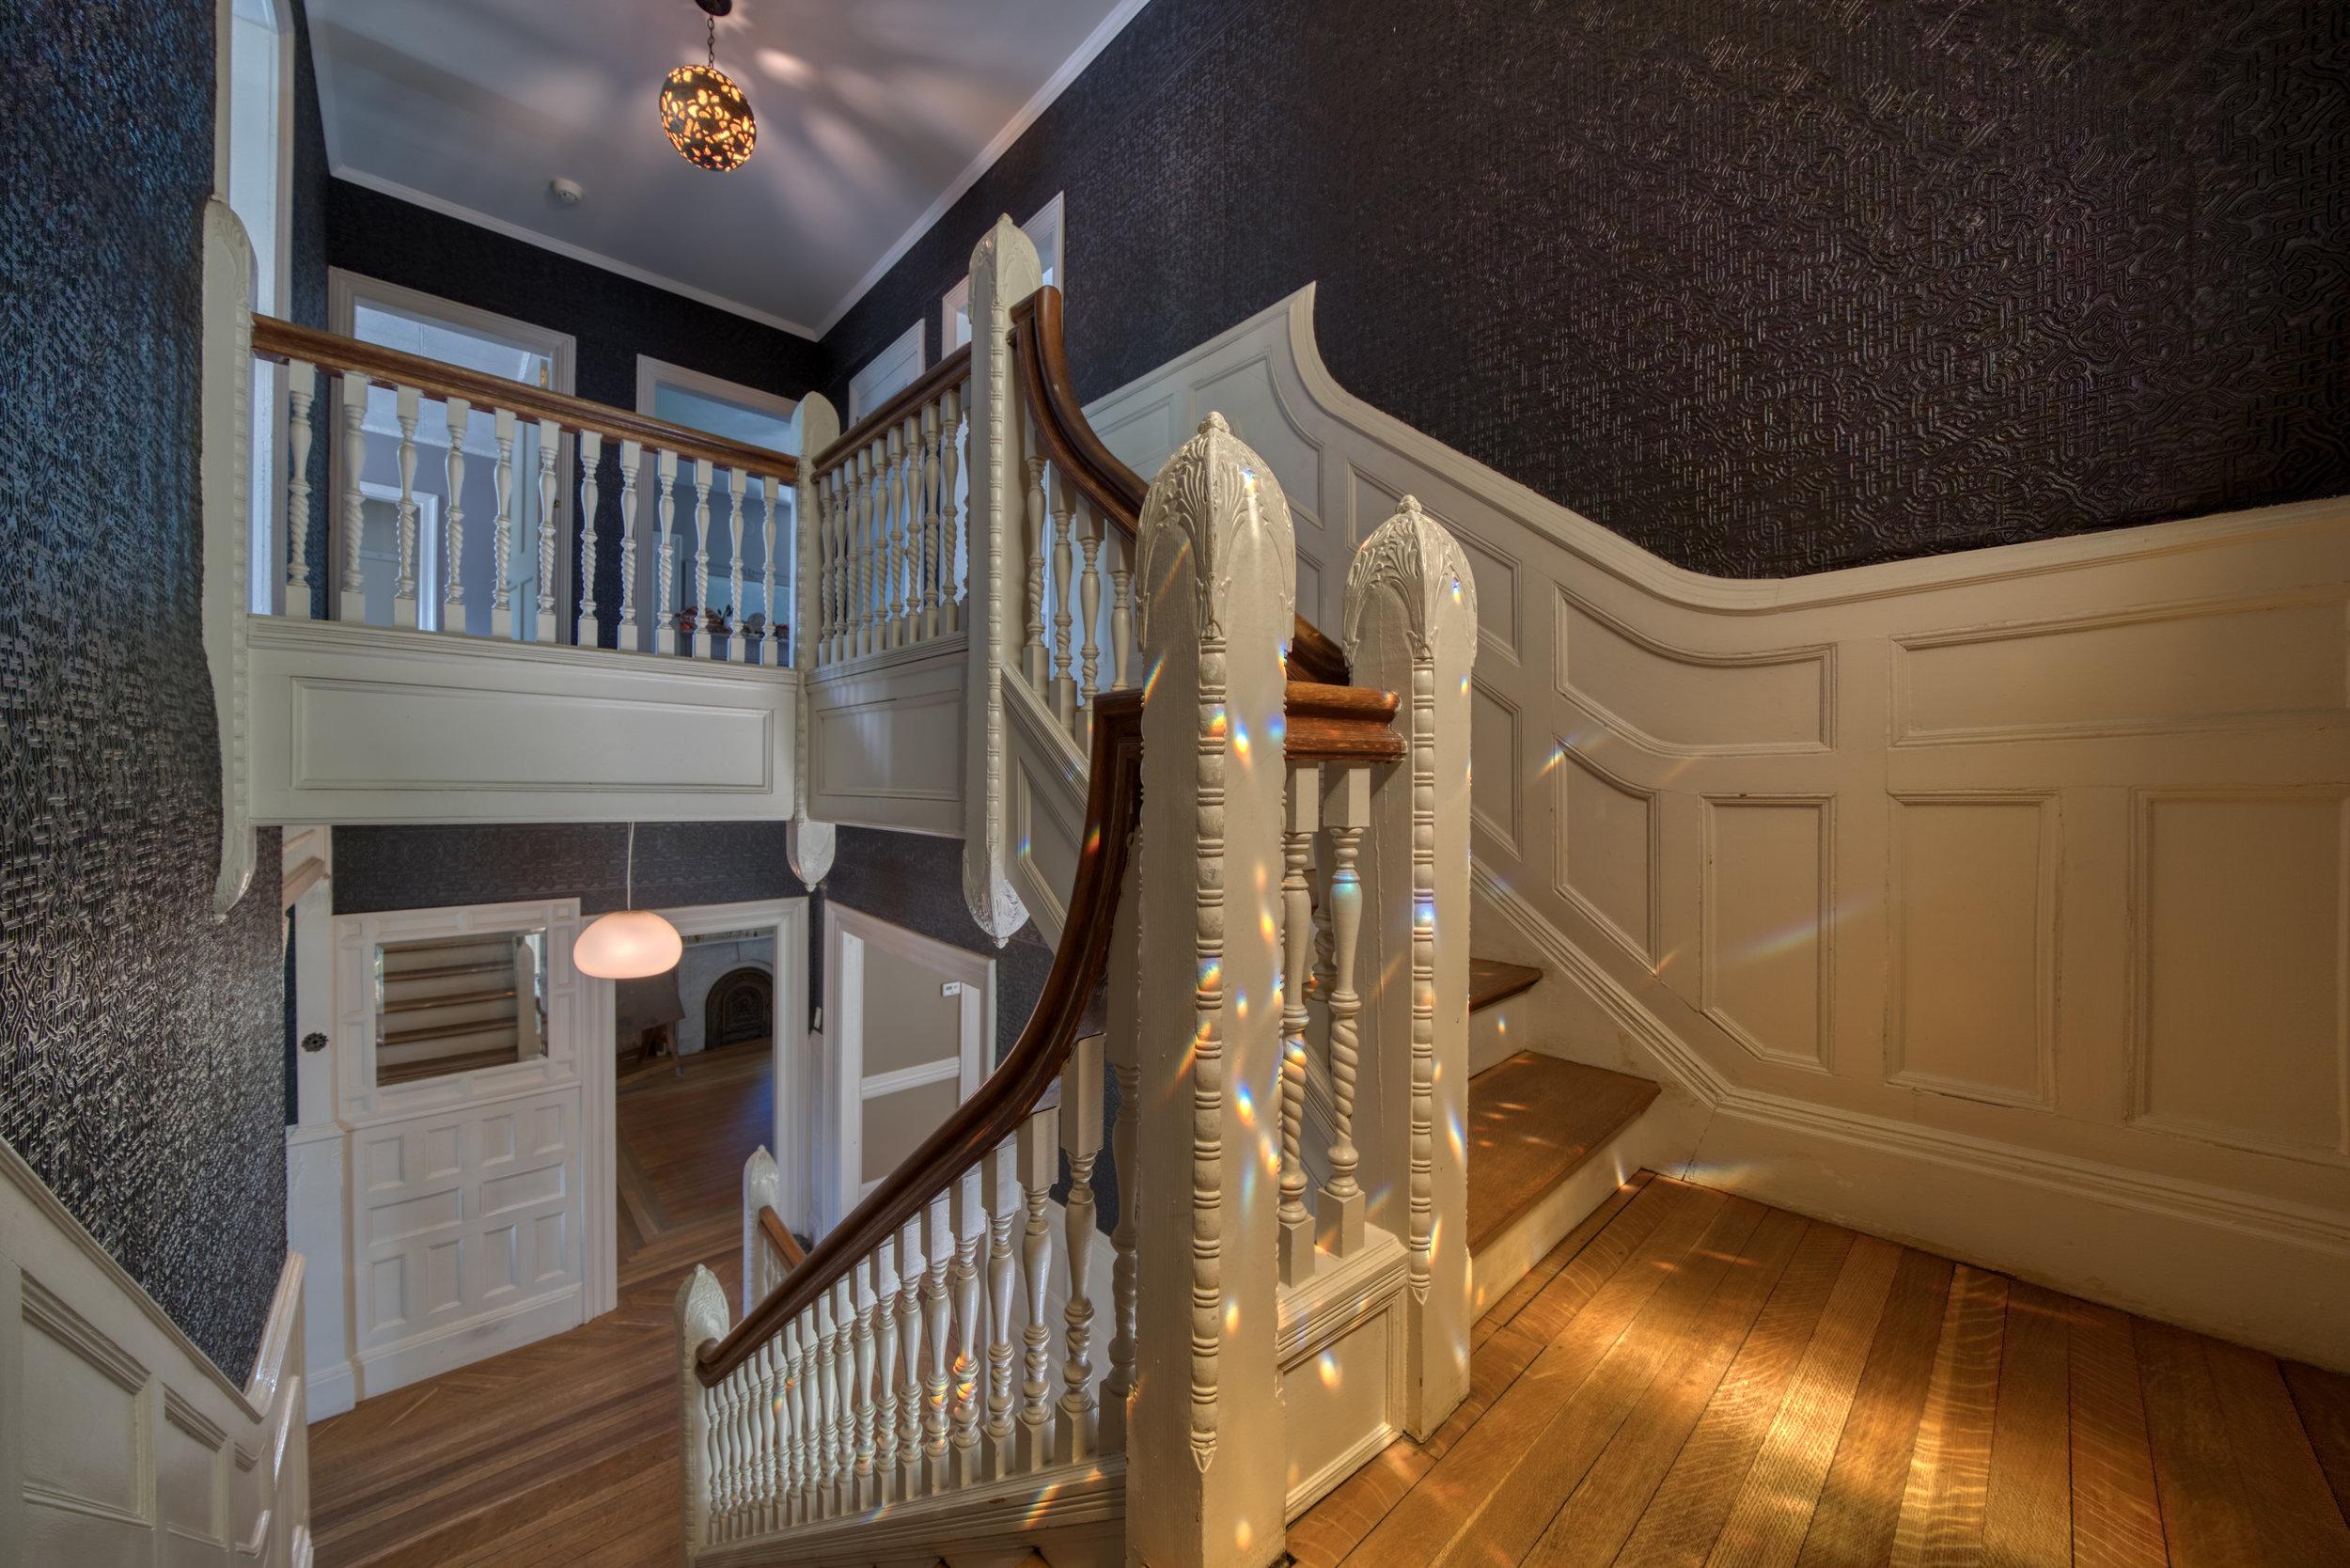 Uptown-Kingston_Stainglass-Stairs-1.jpg